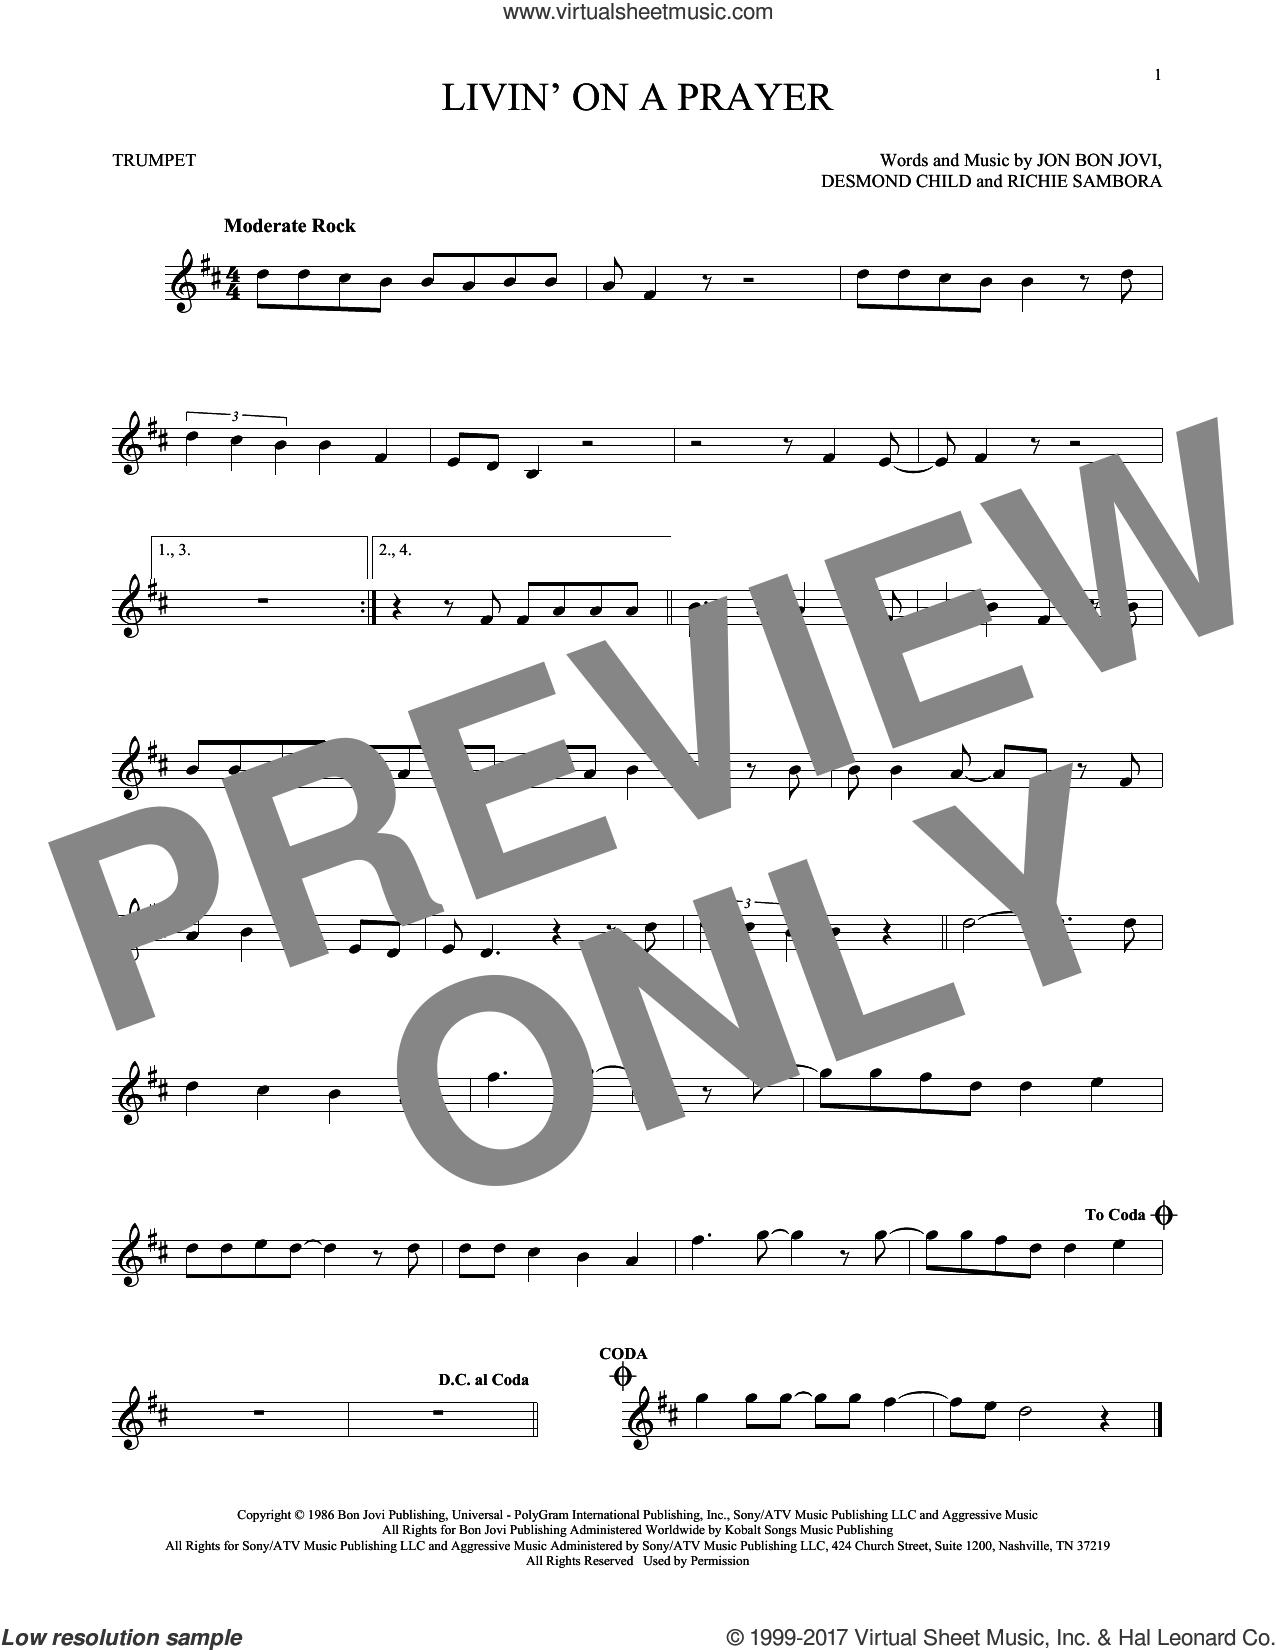 Livin' On A Prayer sheet music for trumpet solo by Bon Jovi, Desmond Child and Richie Sambora, intermediate skill level